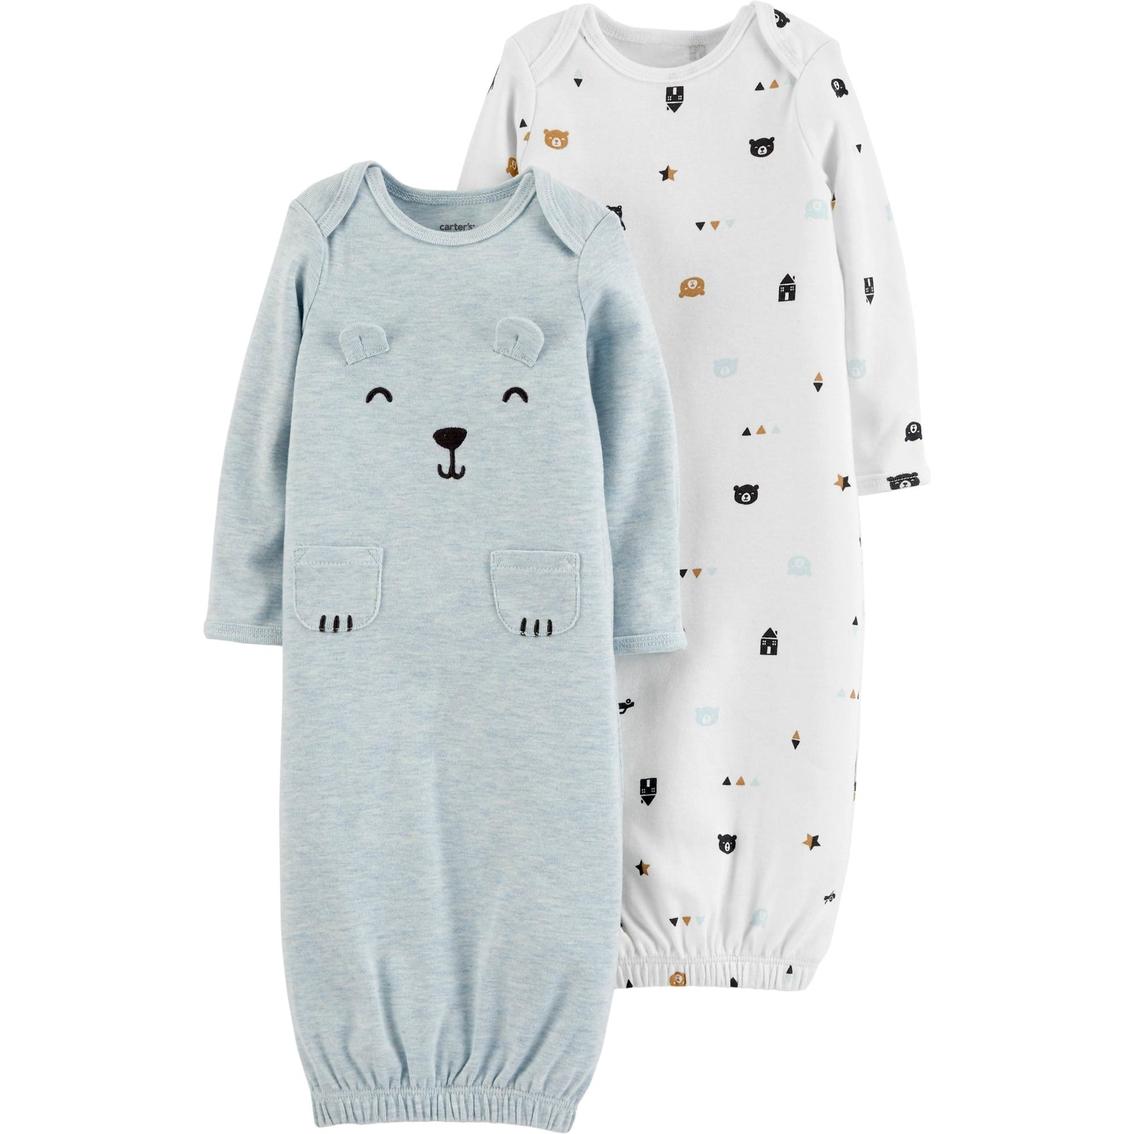 Carter\'s Infant Boys Babysoft Sleeper Gown 2 Pk. | Baby Boy 0-24 ...